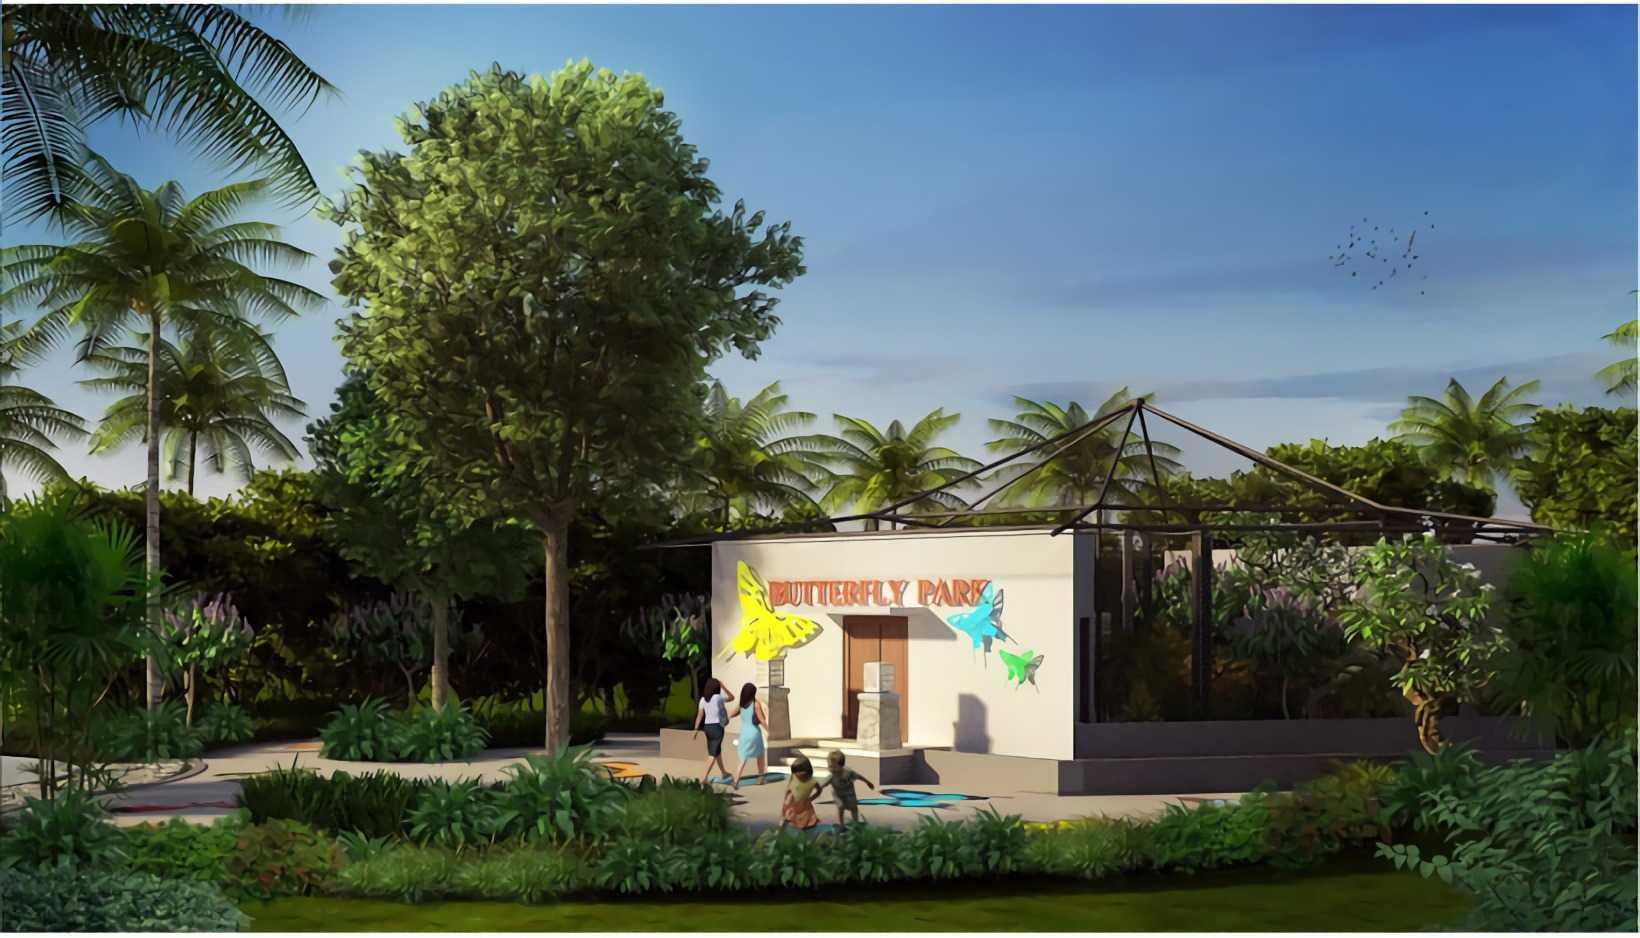 Hg Architects & Designers Associates Taman Wisata Alam Gunung Tunak Lombok, Ntb Lombok, Ntb Butterfly Park   24343